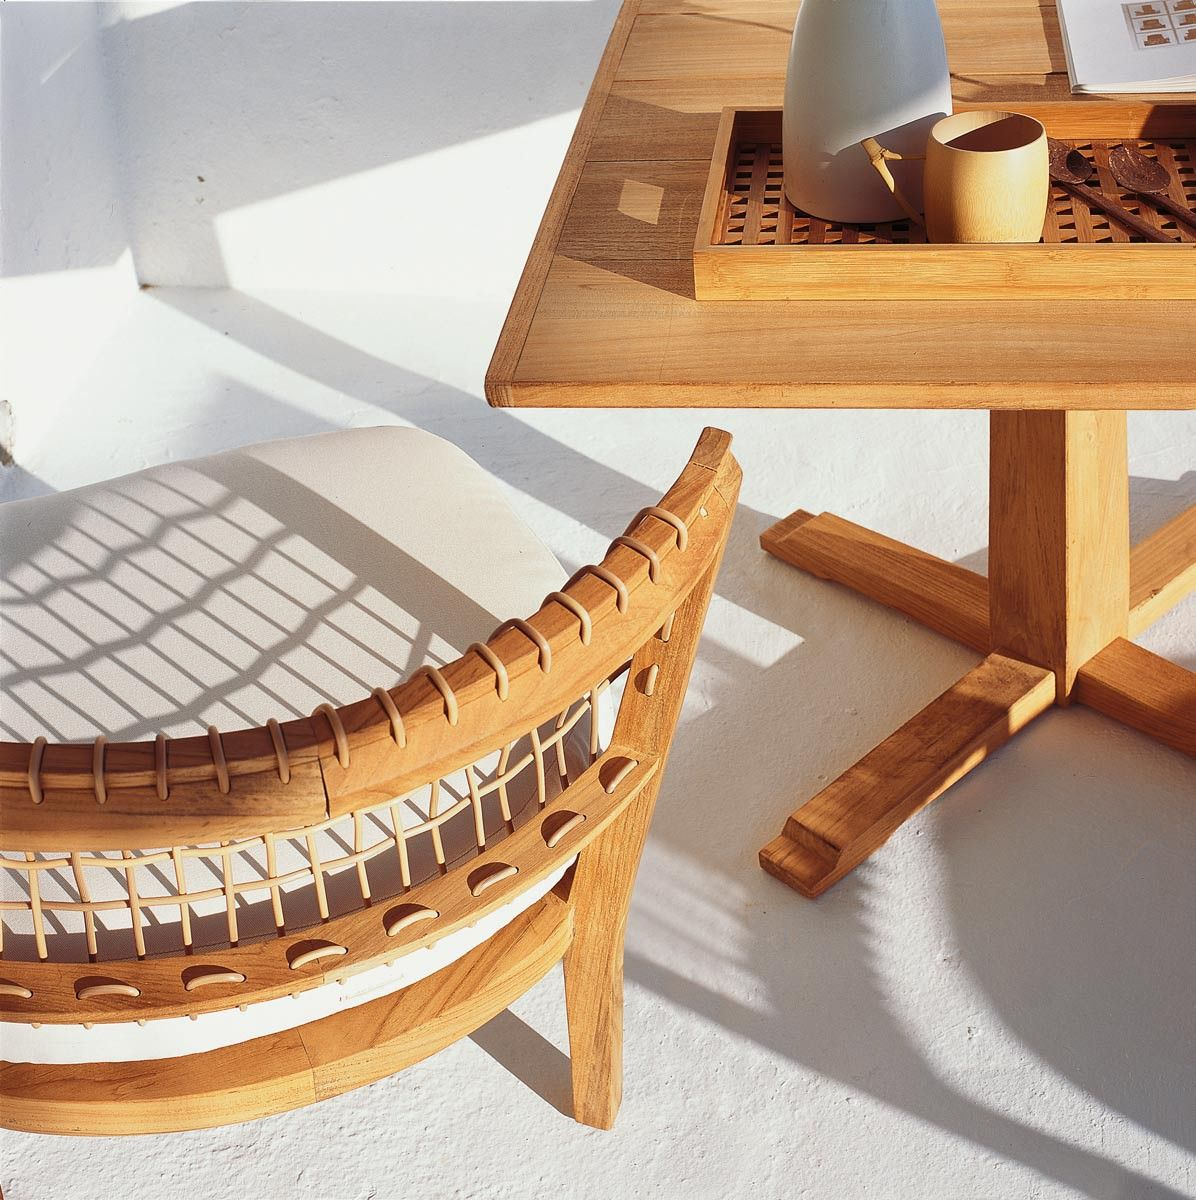 petit fauteuil bas synthesis unopi carrega pinterest. Black Bedroom Furniture Sets. Home Design Ideas